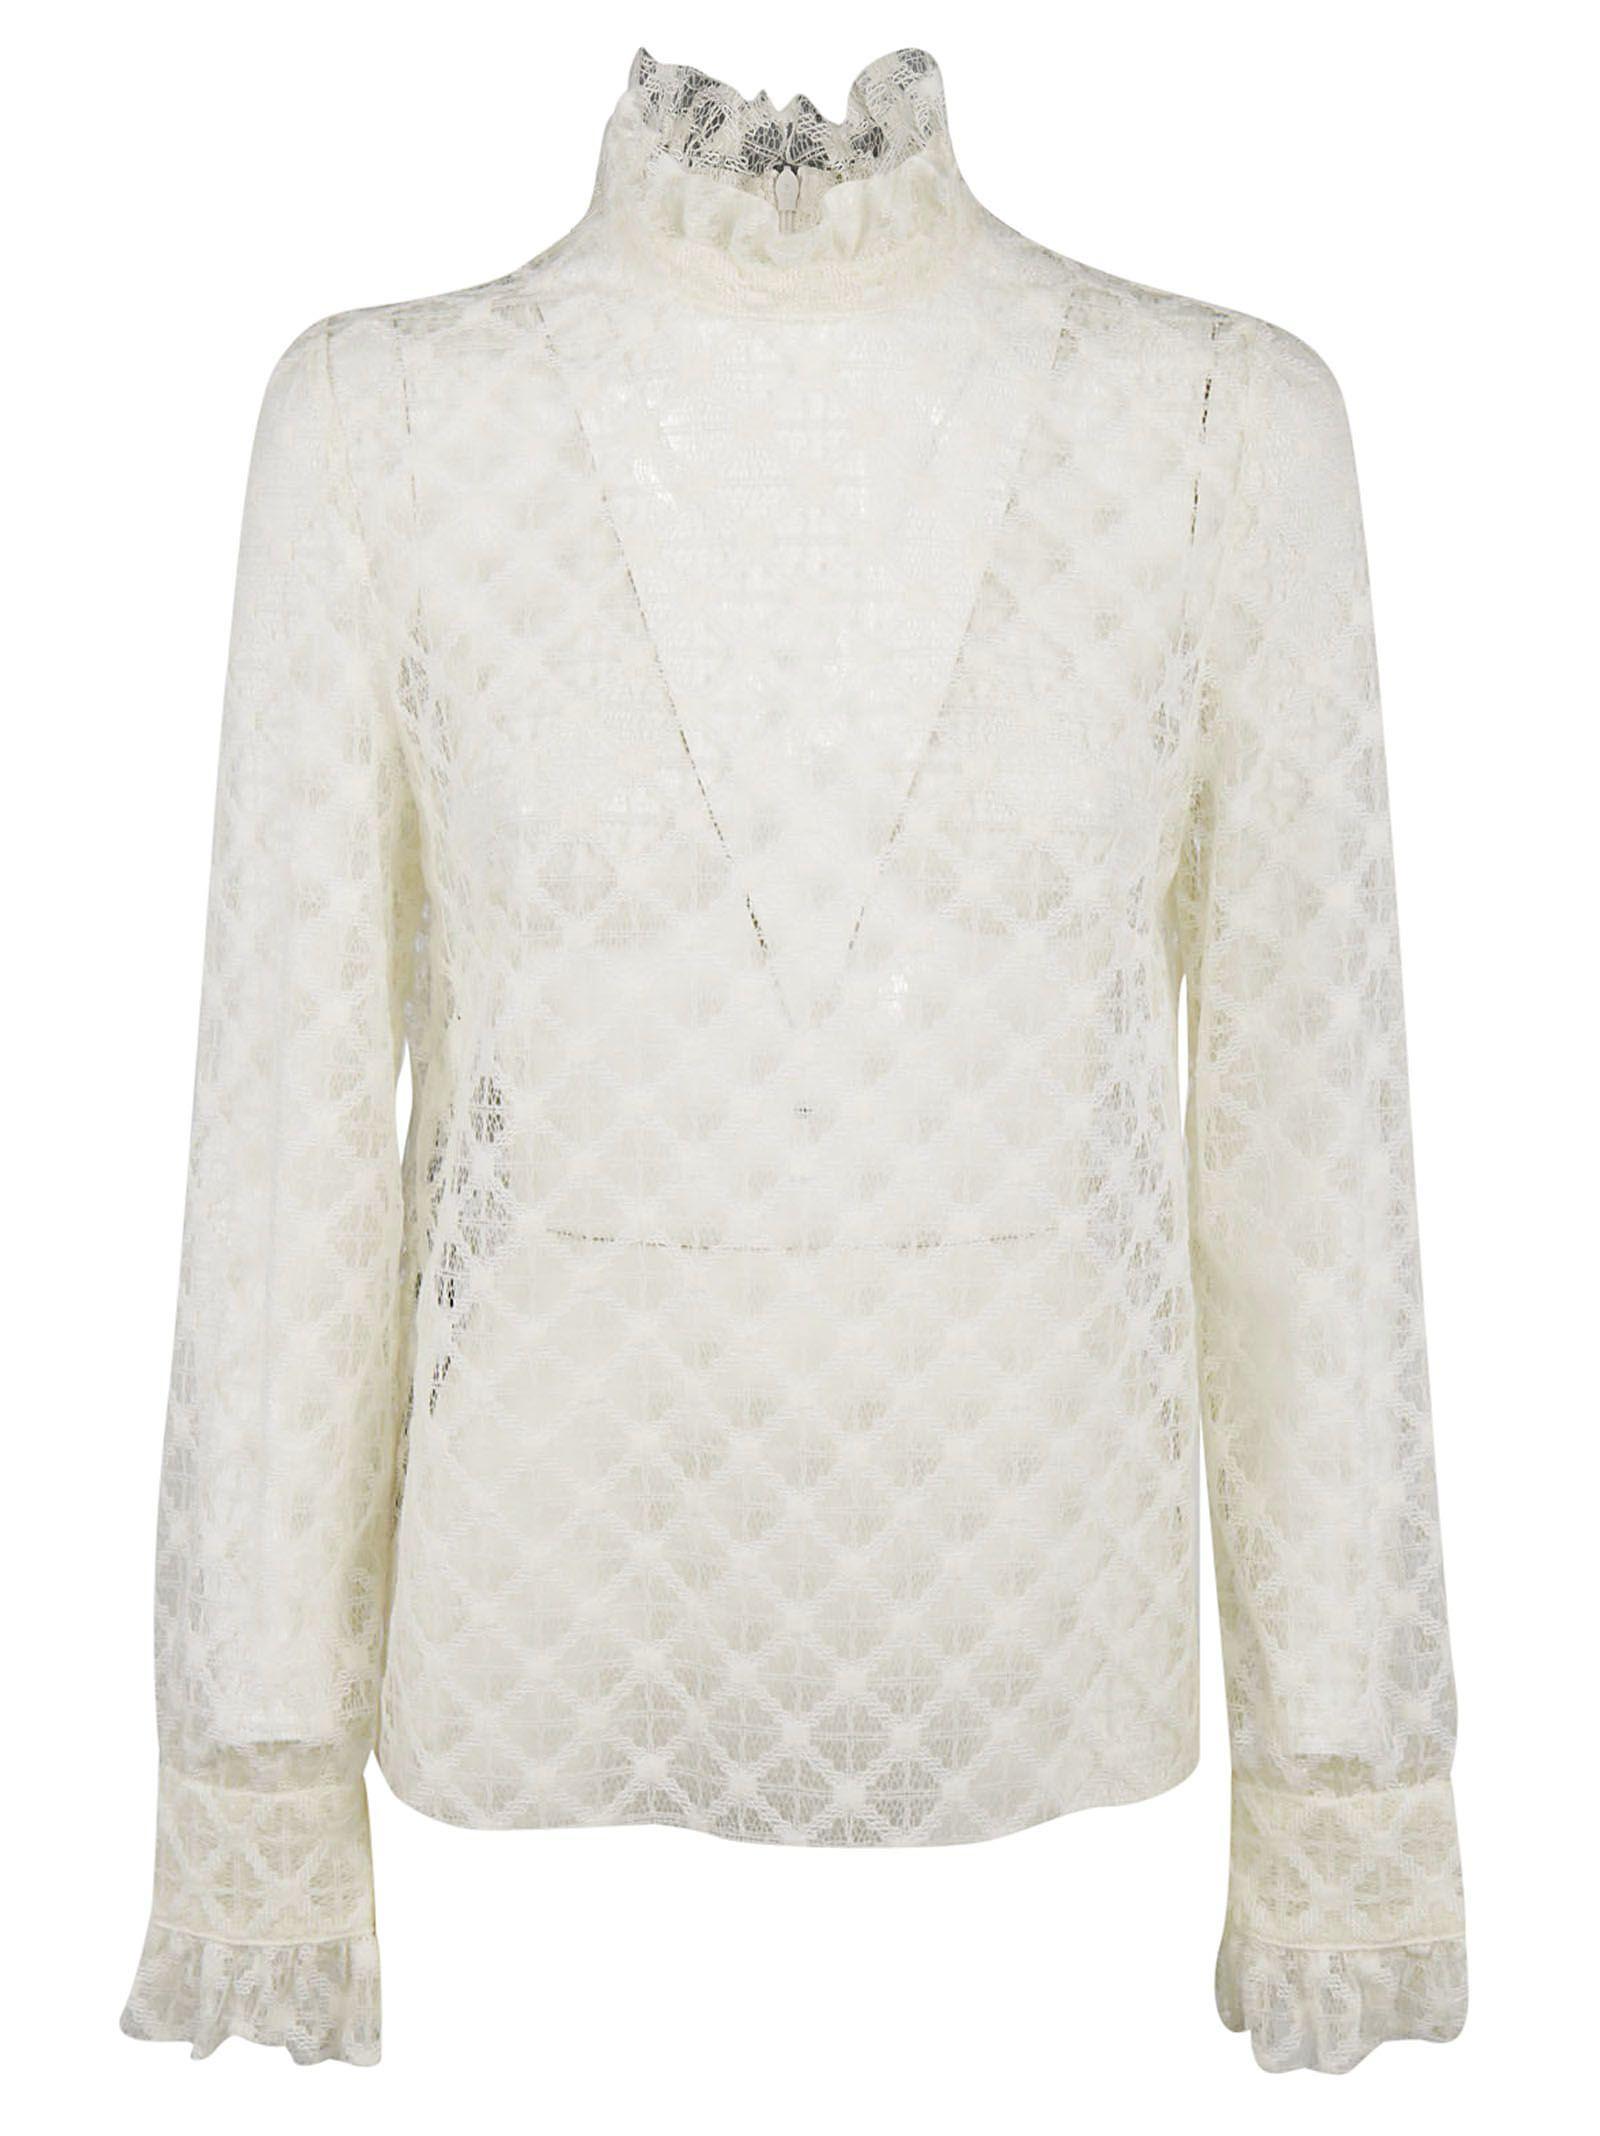 Philosophy Di Lorenzo Serafini Lace Detail Blouse In White